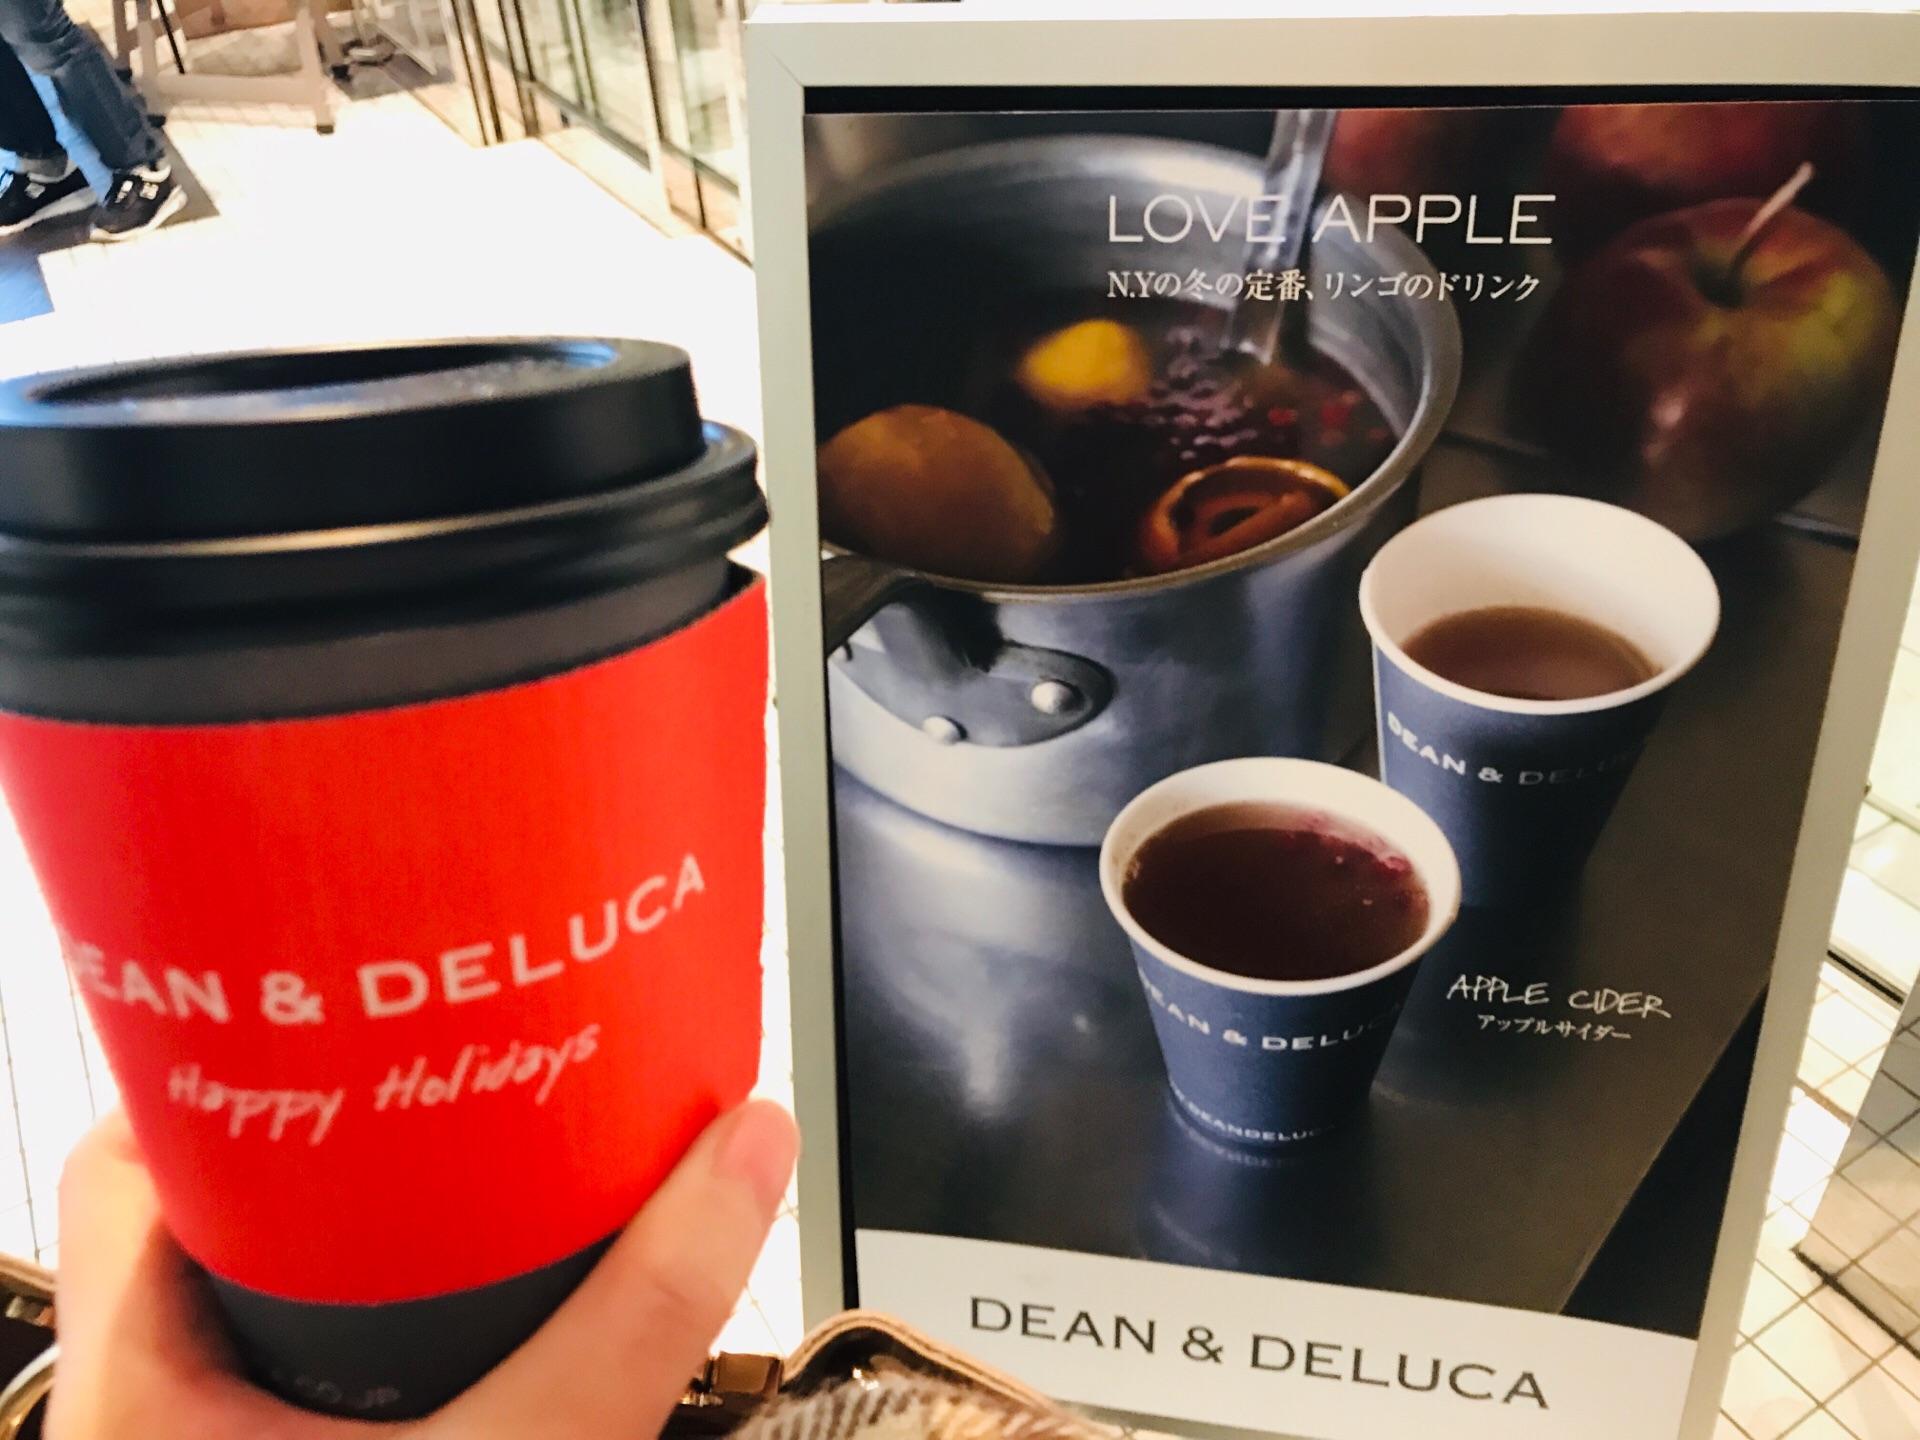 【DEAN&DELUCA】冬の定番ドリンク!《ホットアップルサイダー》今年もお目見え♡_1